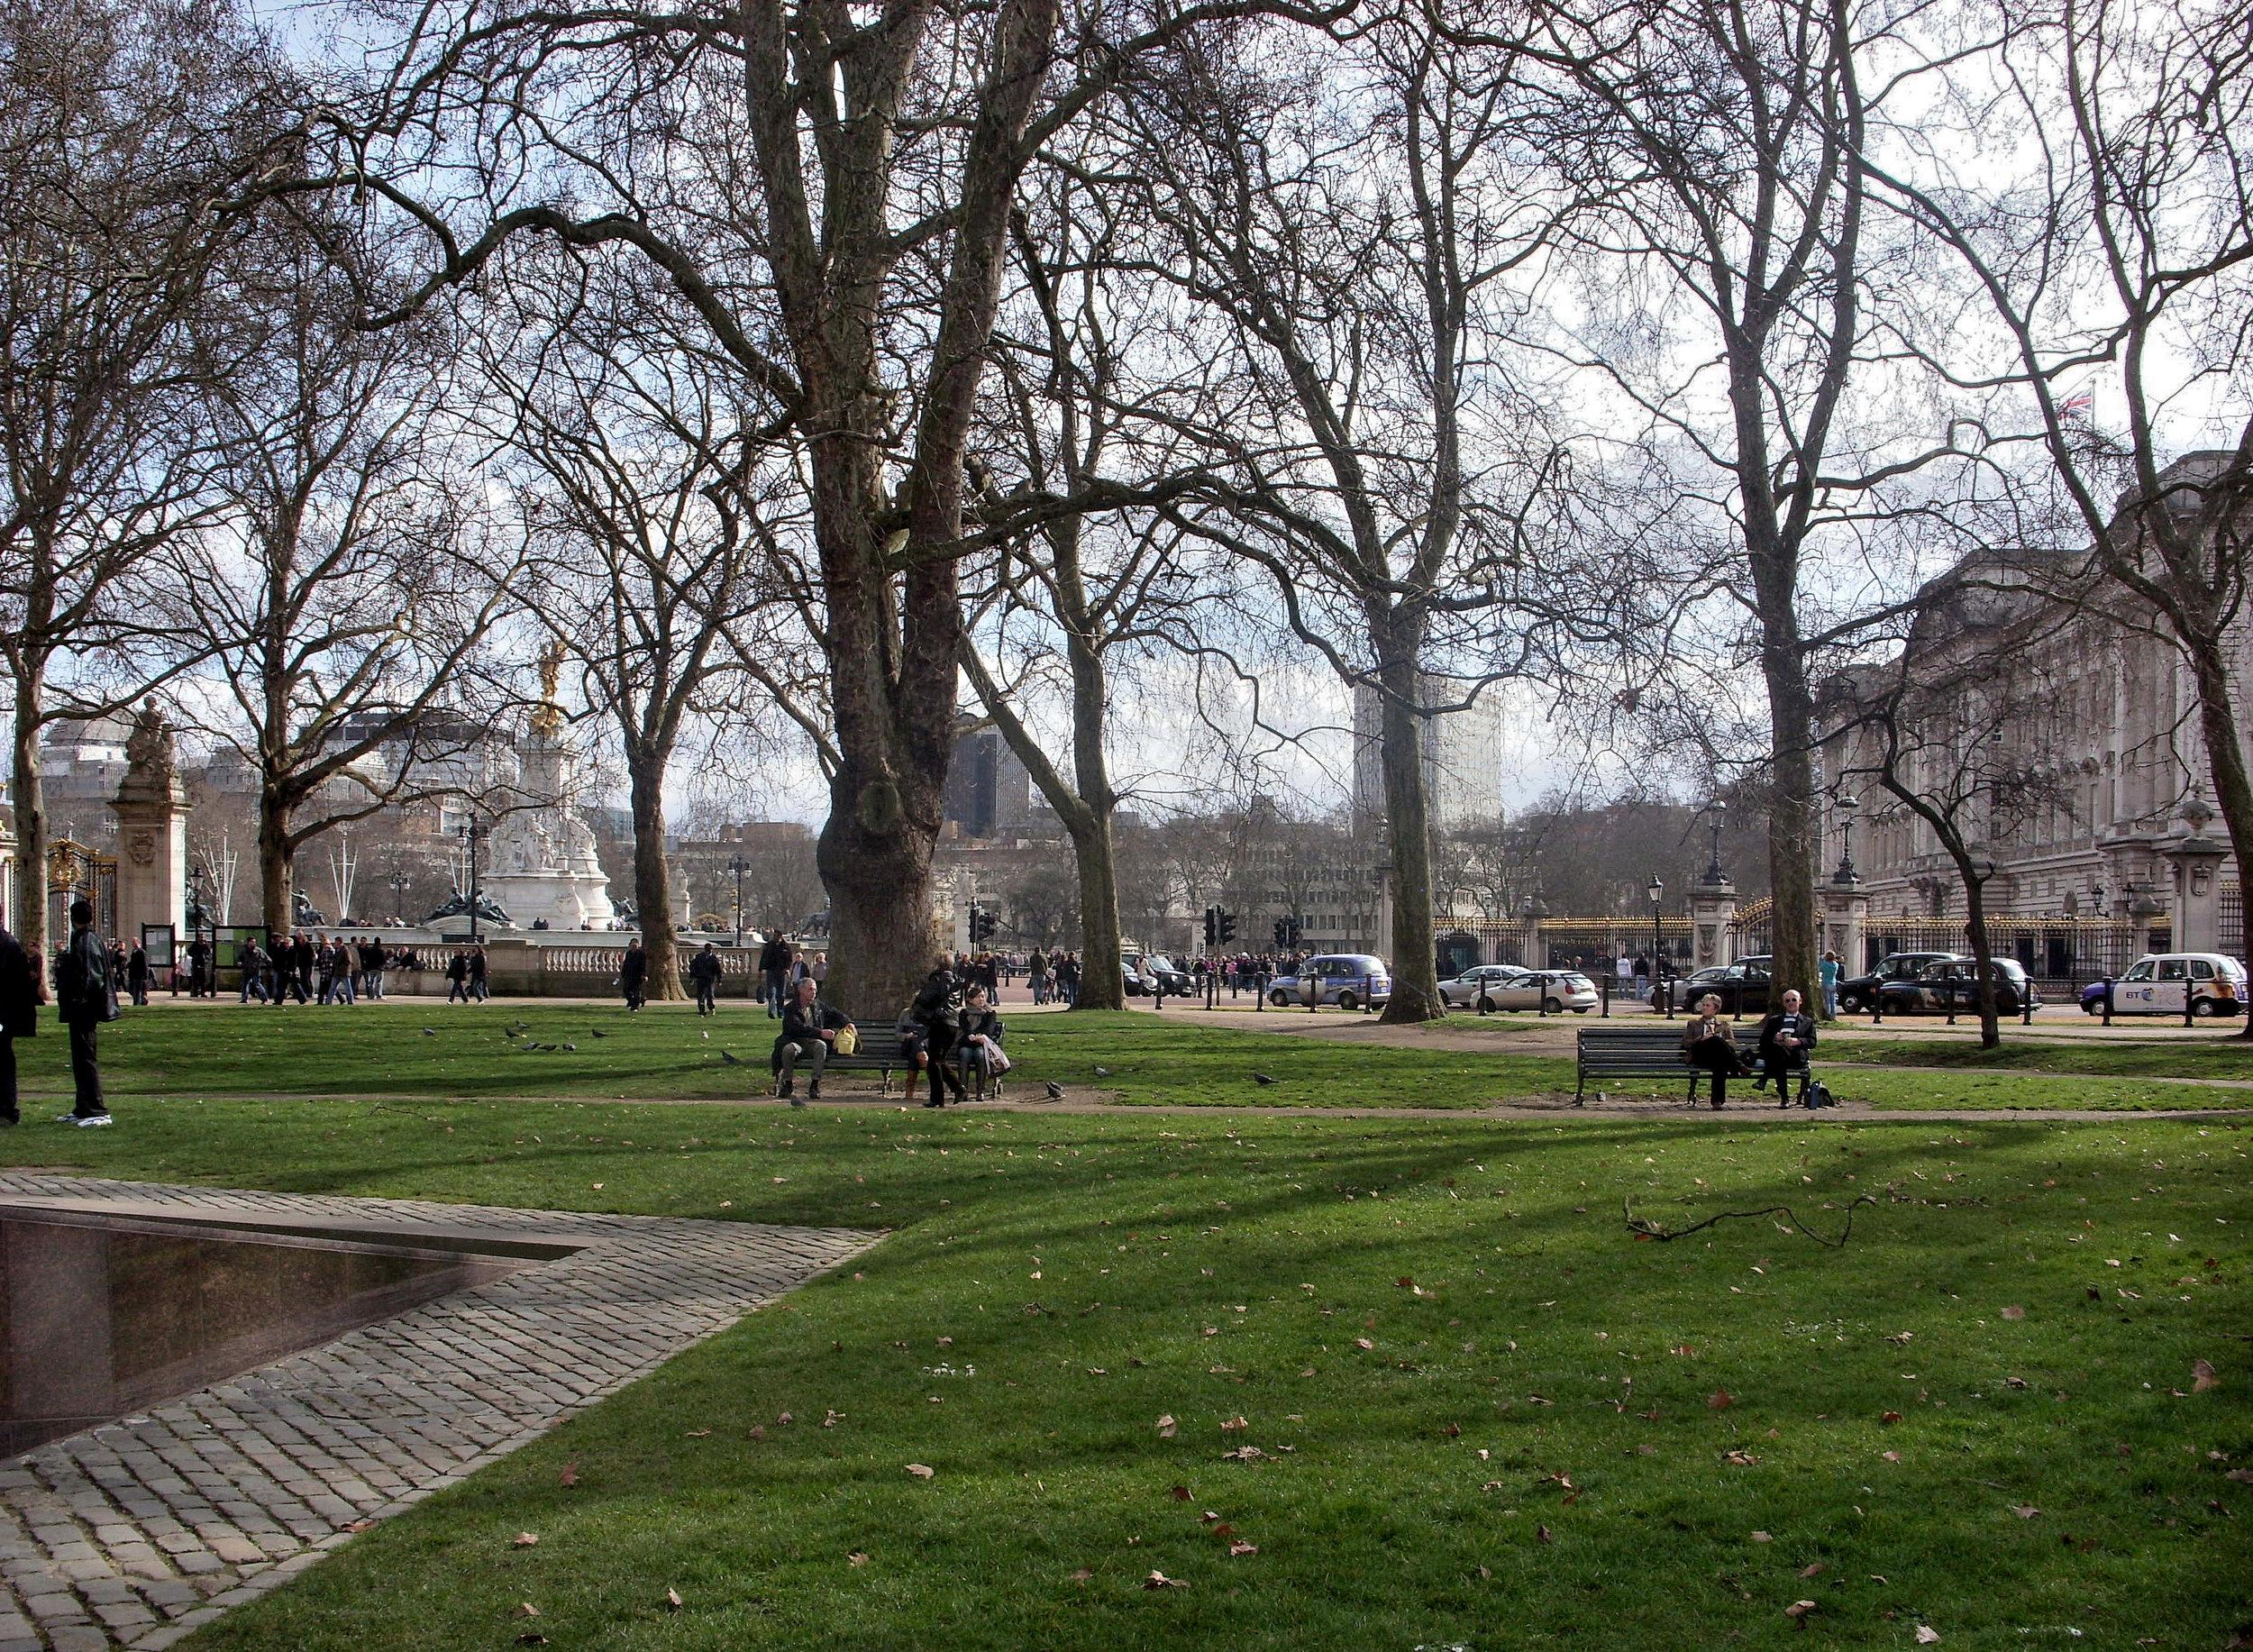 Buckingham_Palace_from_Green_Park.jpg